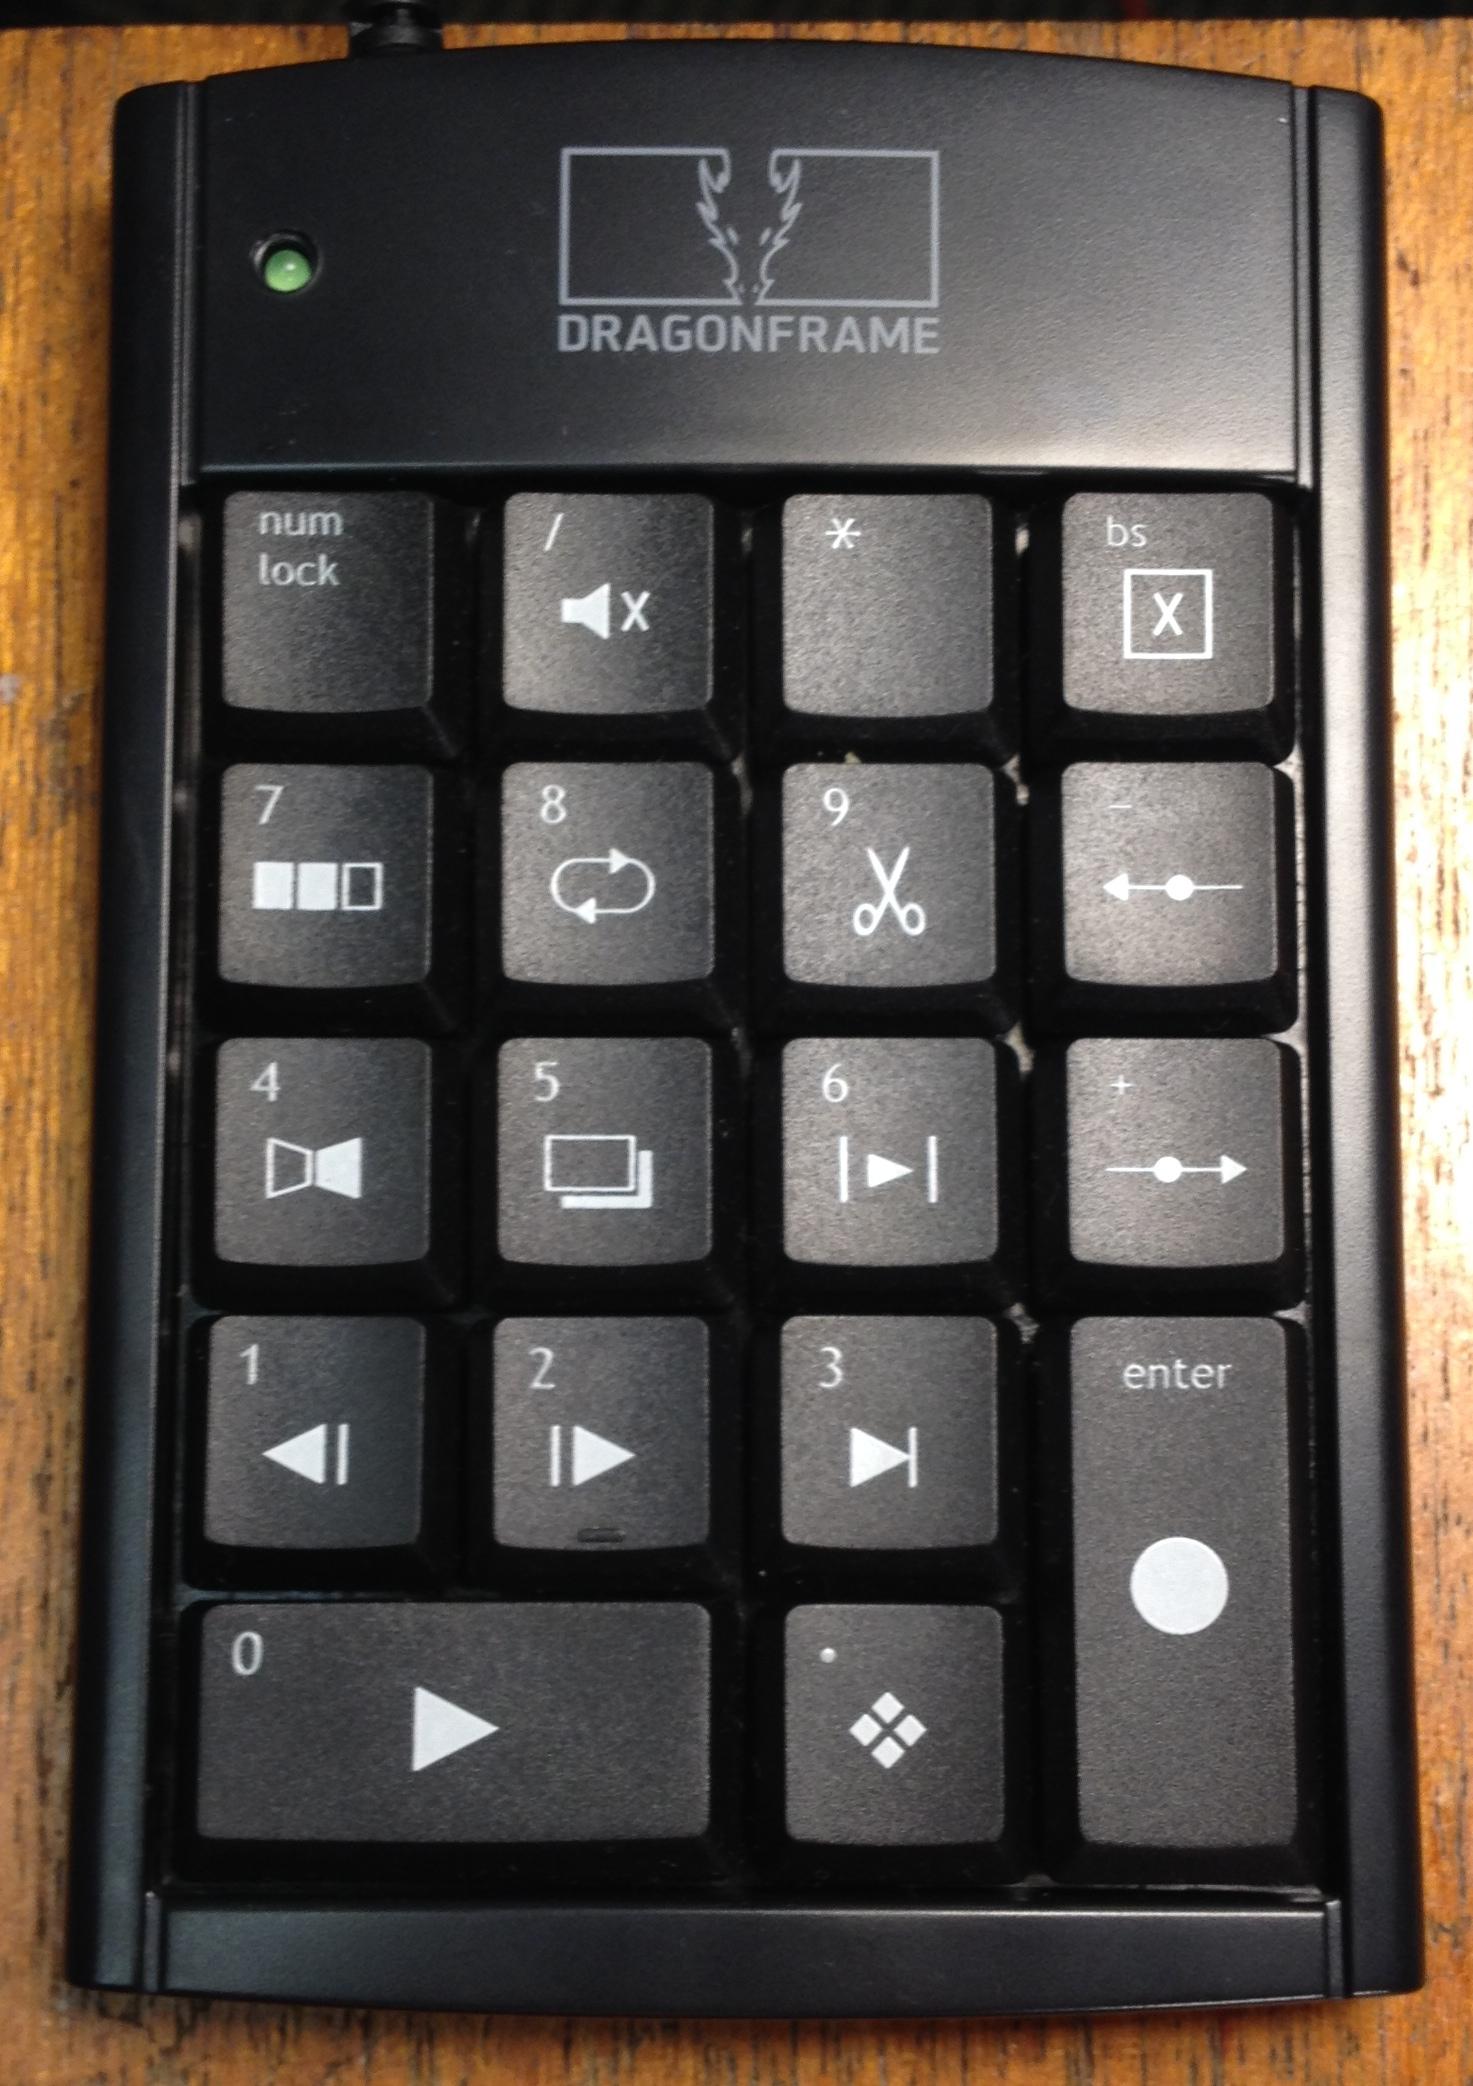 the dragonframe keypad - Dragon Frame